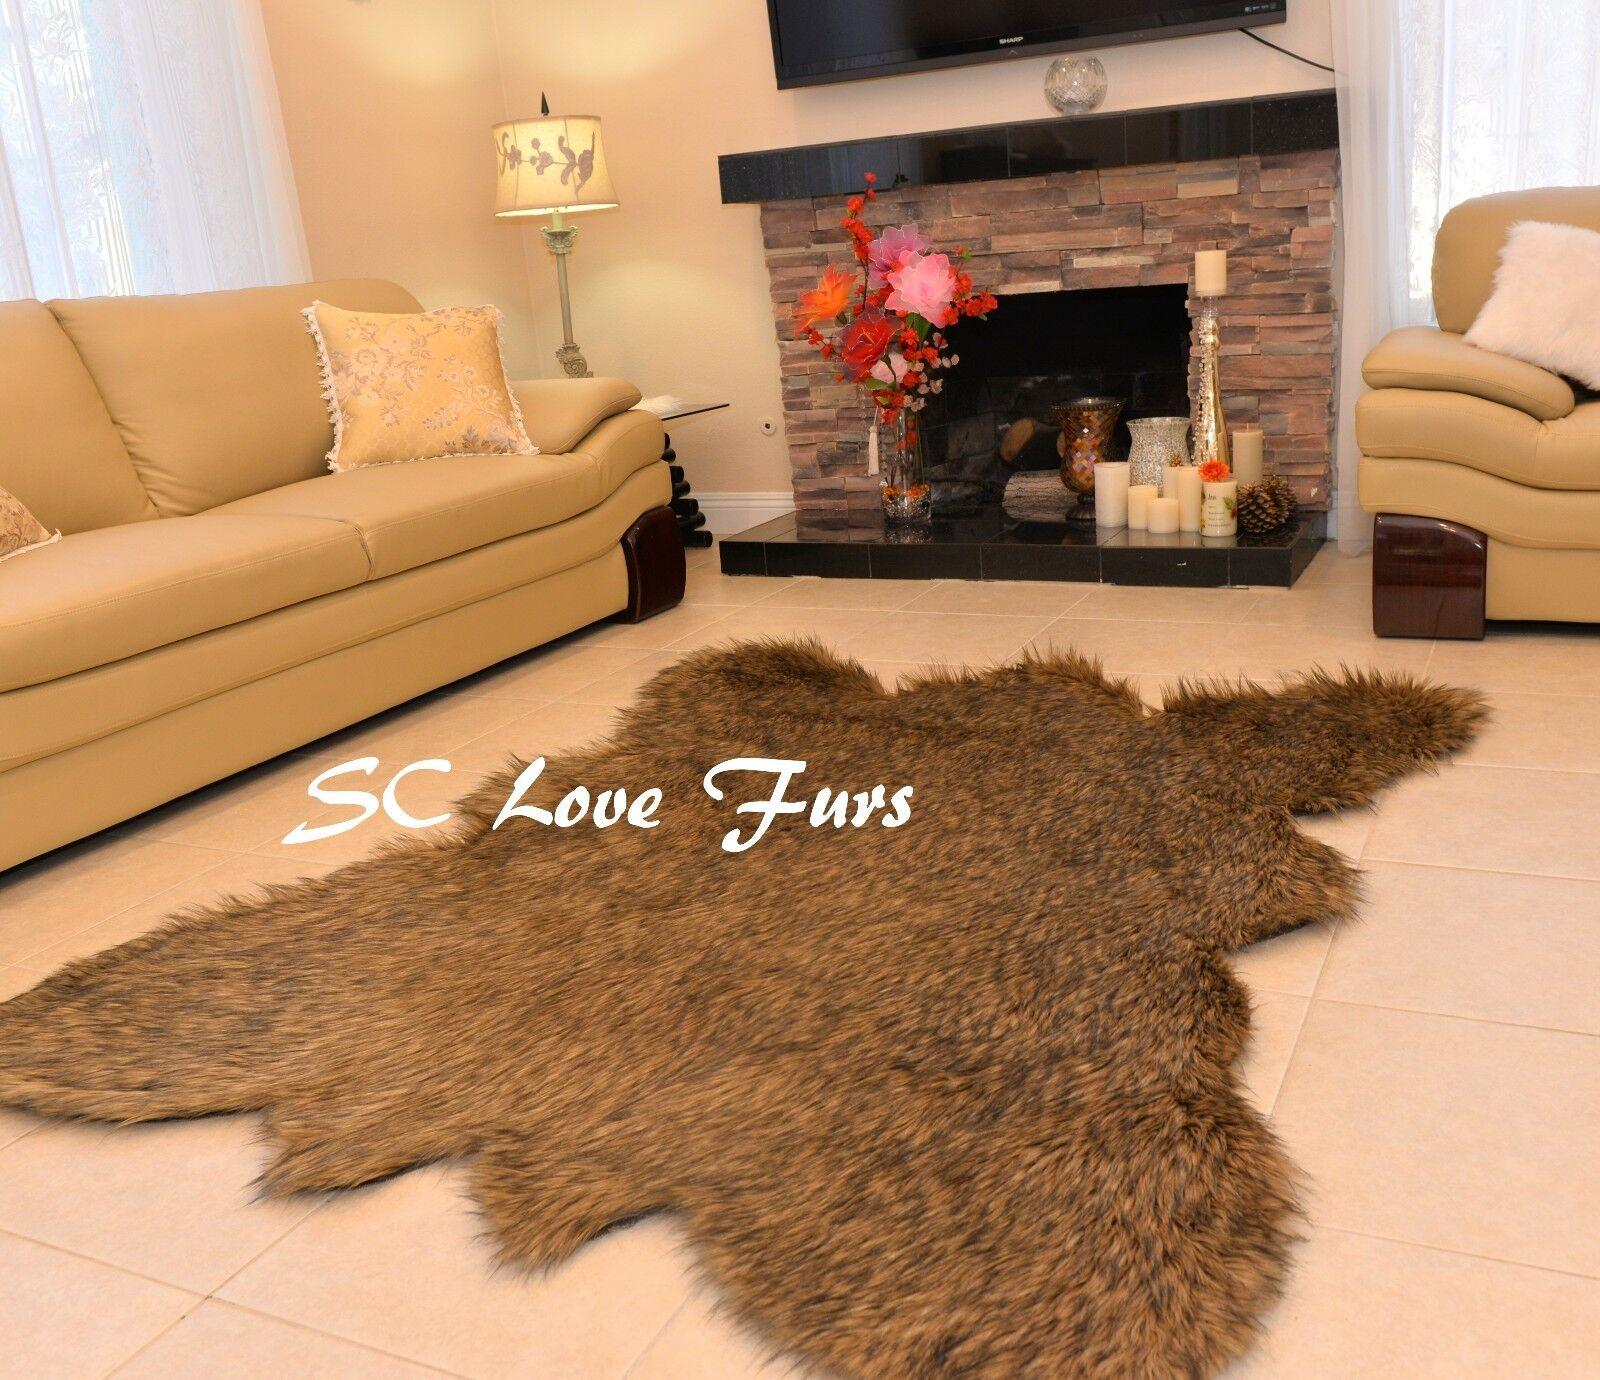 Furry Grizzly Bearskin Marronee Tip Faux Fur Area Rug Christmas Lodge Home Decor